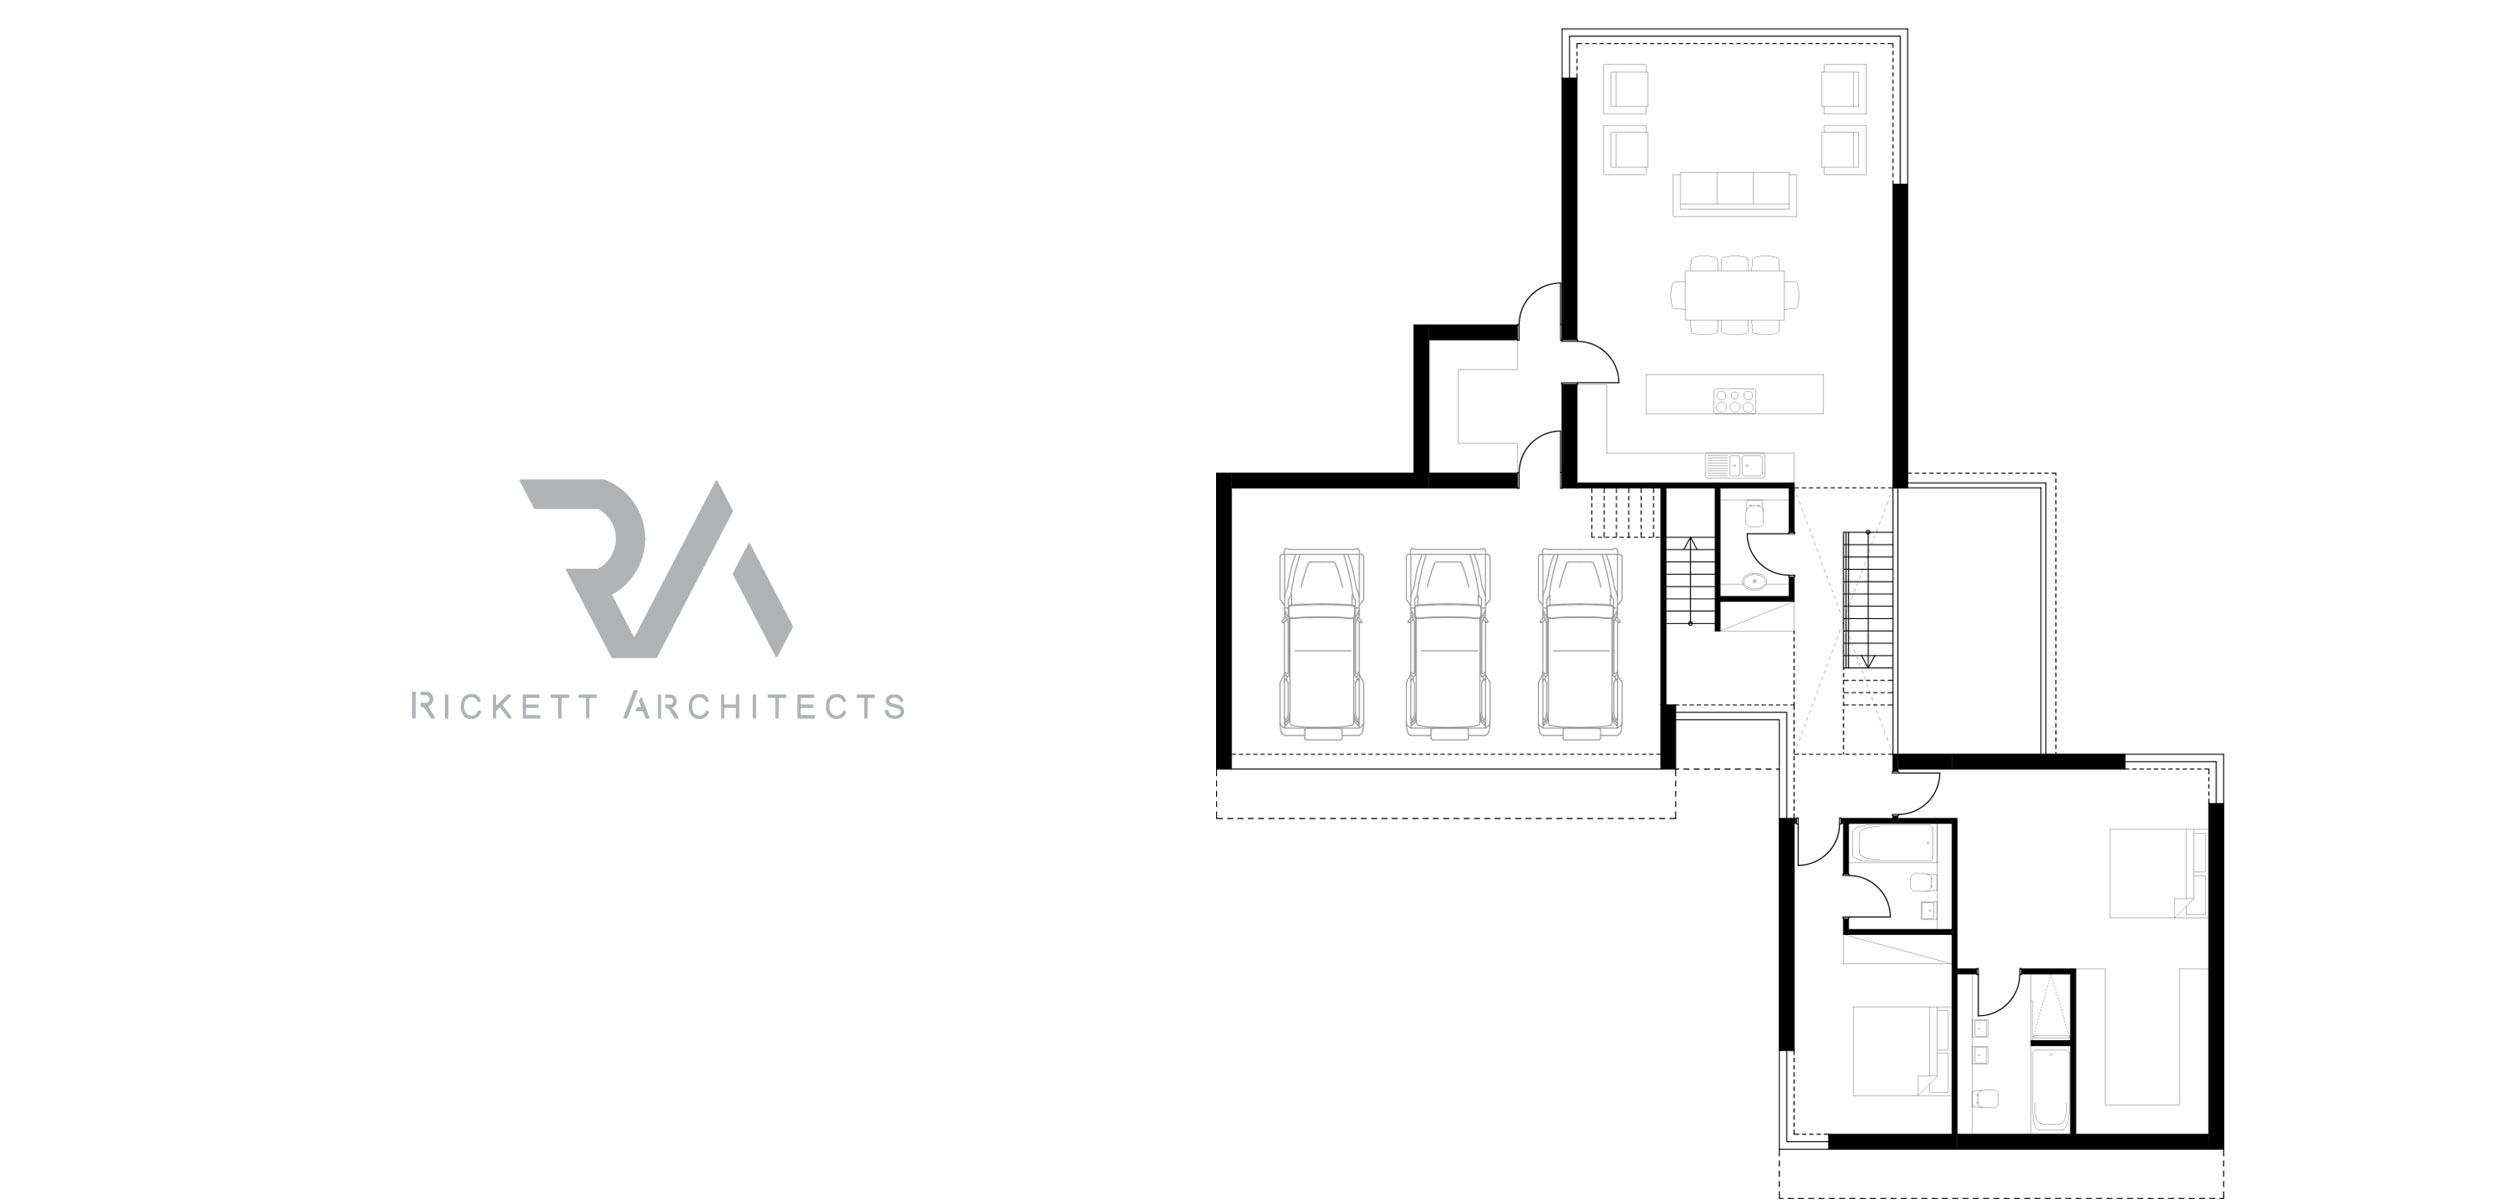 leamington_spa_architects_03.jpg